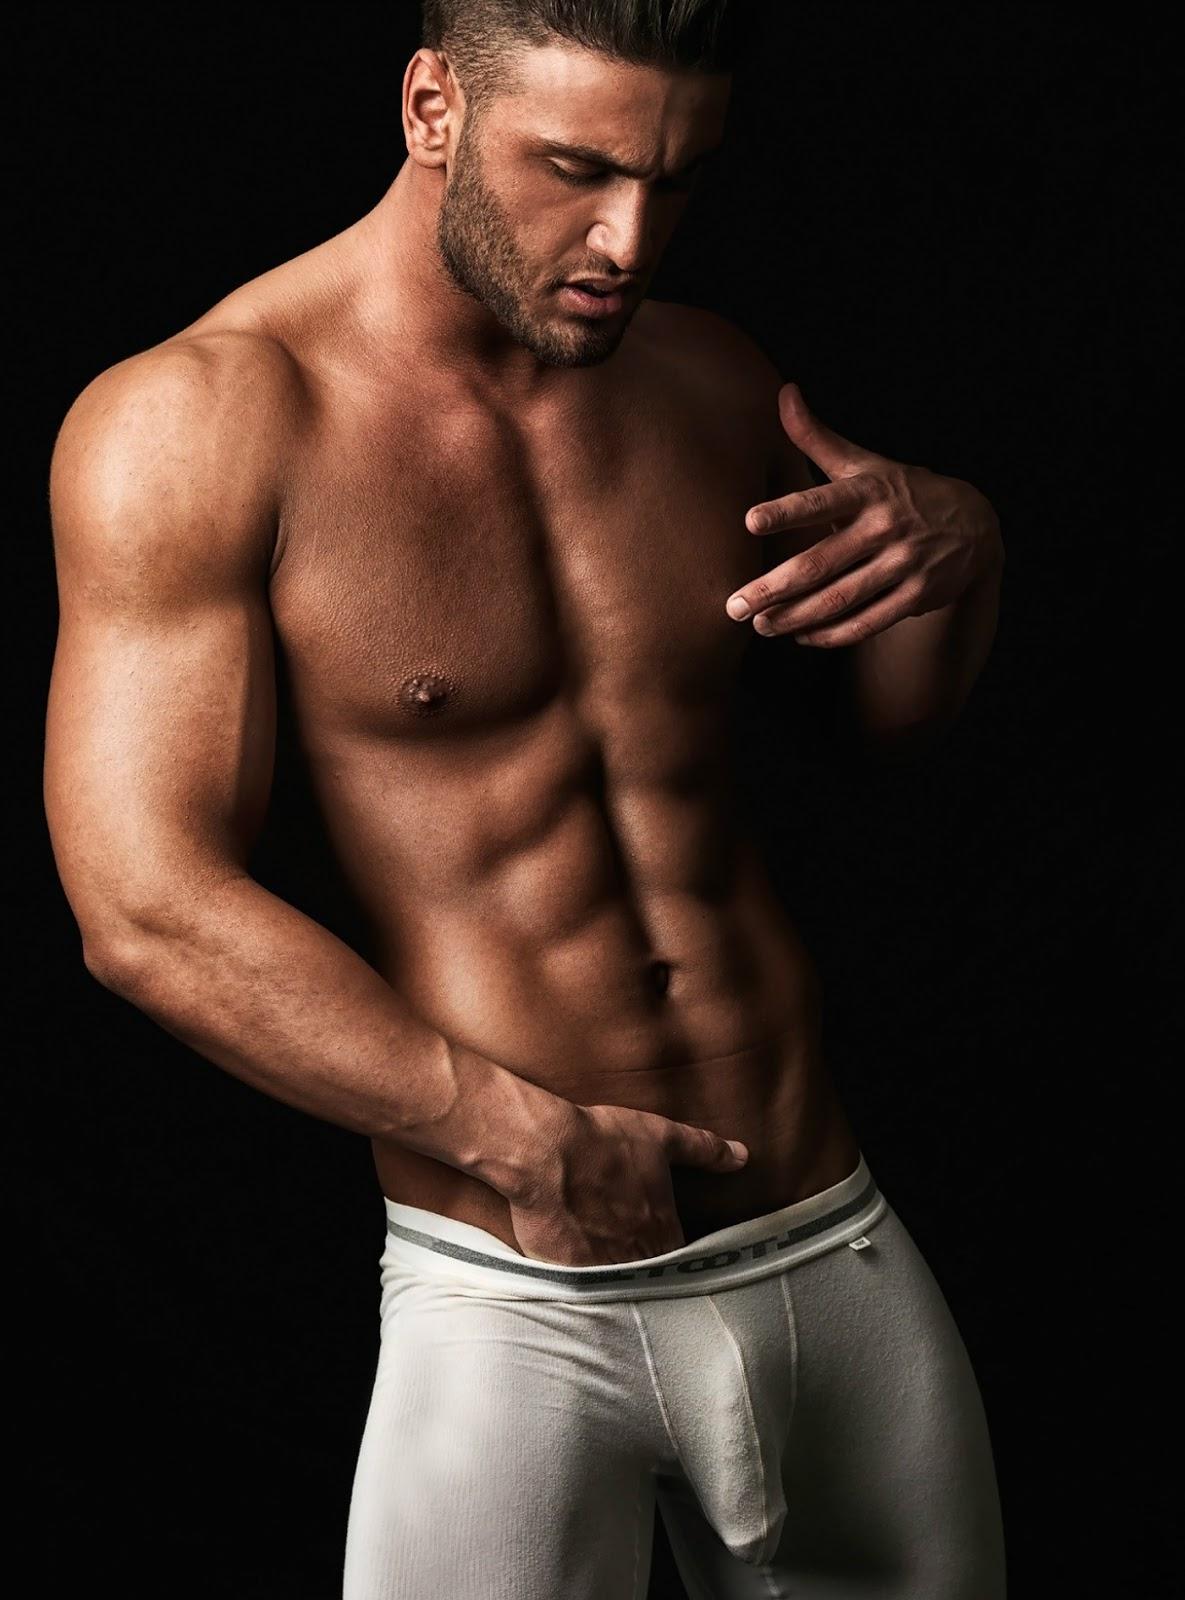 Sean's Masturbating Underwear Model Men Gay When Hunky